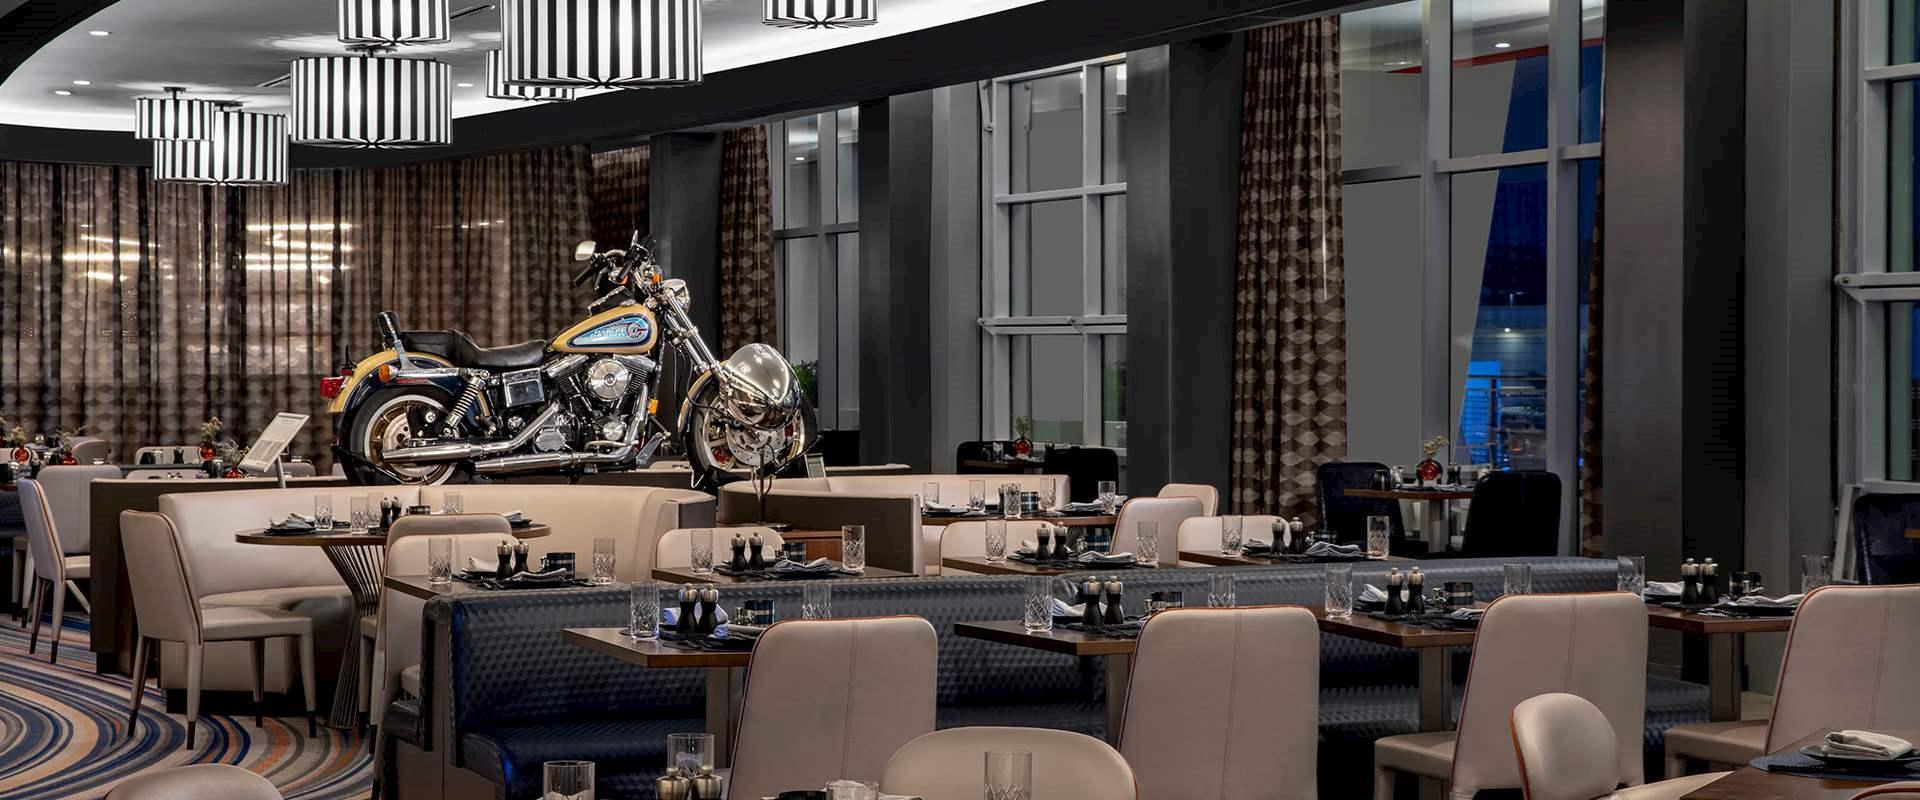 Daytona Beach Hotel Dining Facilities